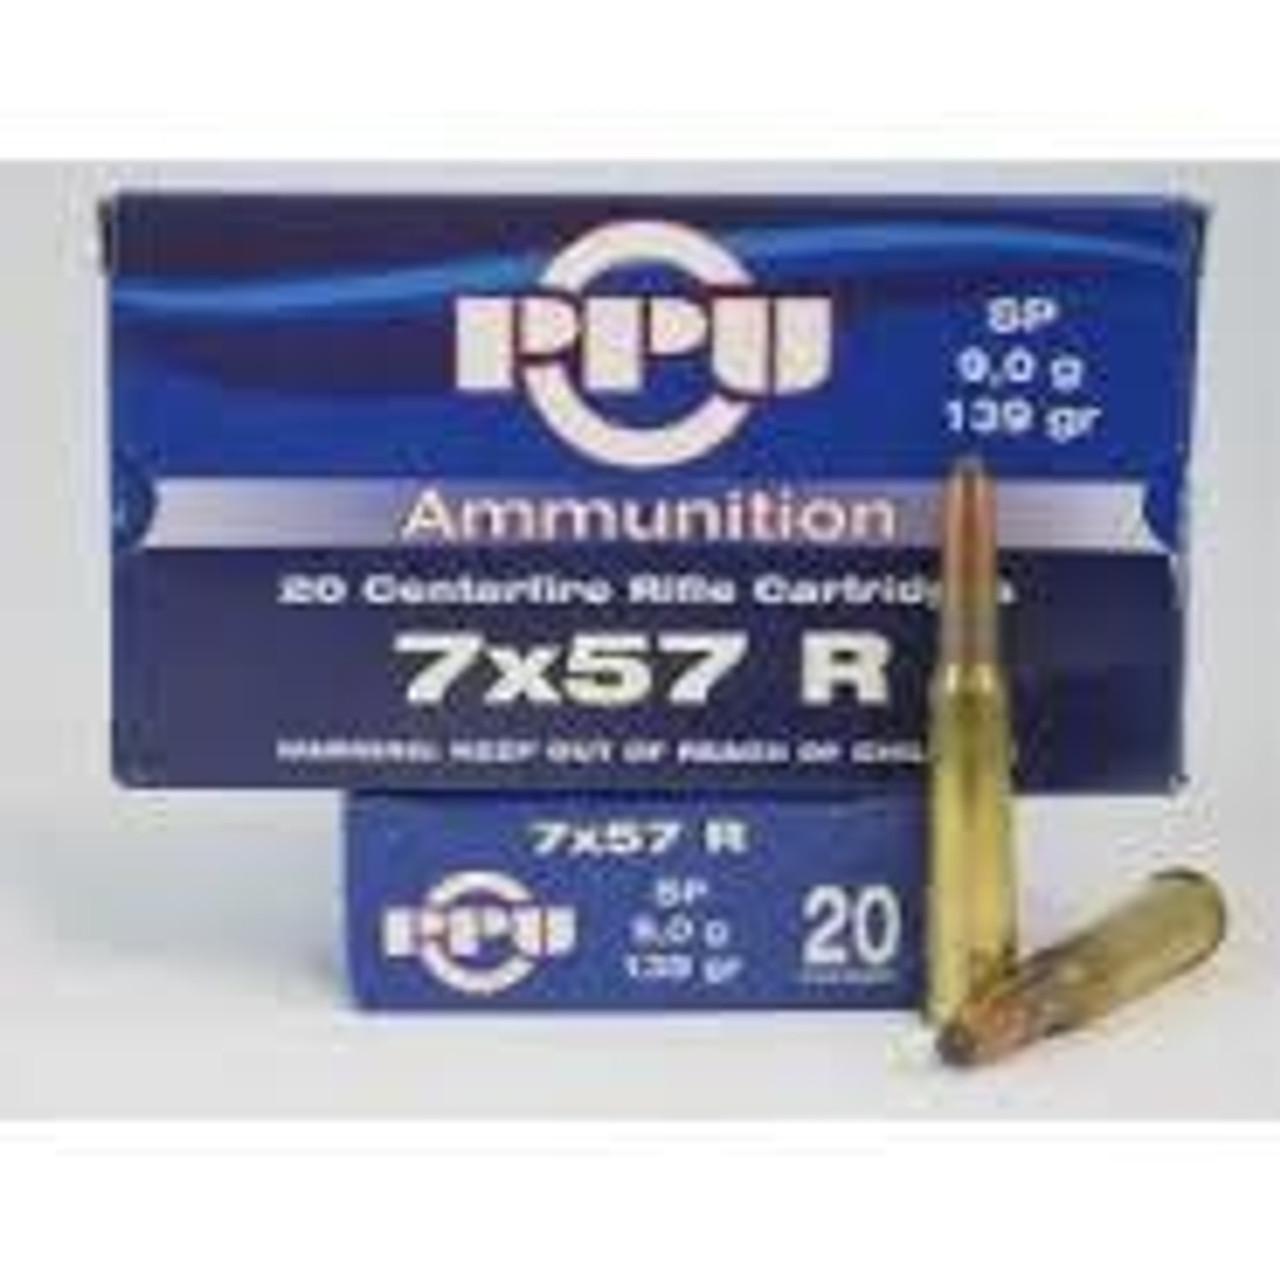 7mm x 57 Rimmed Ammo